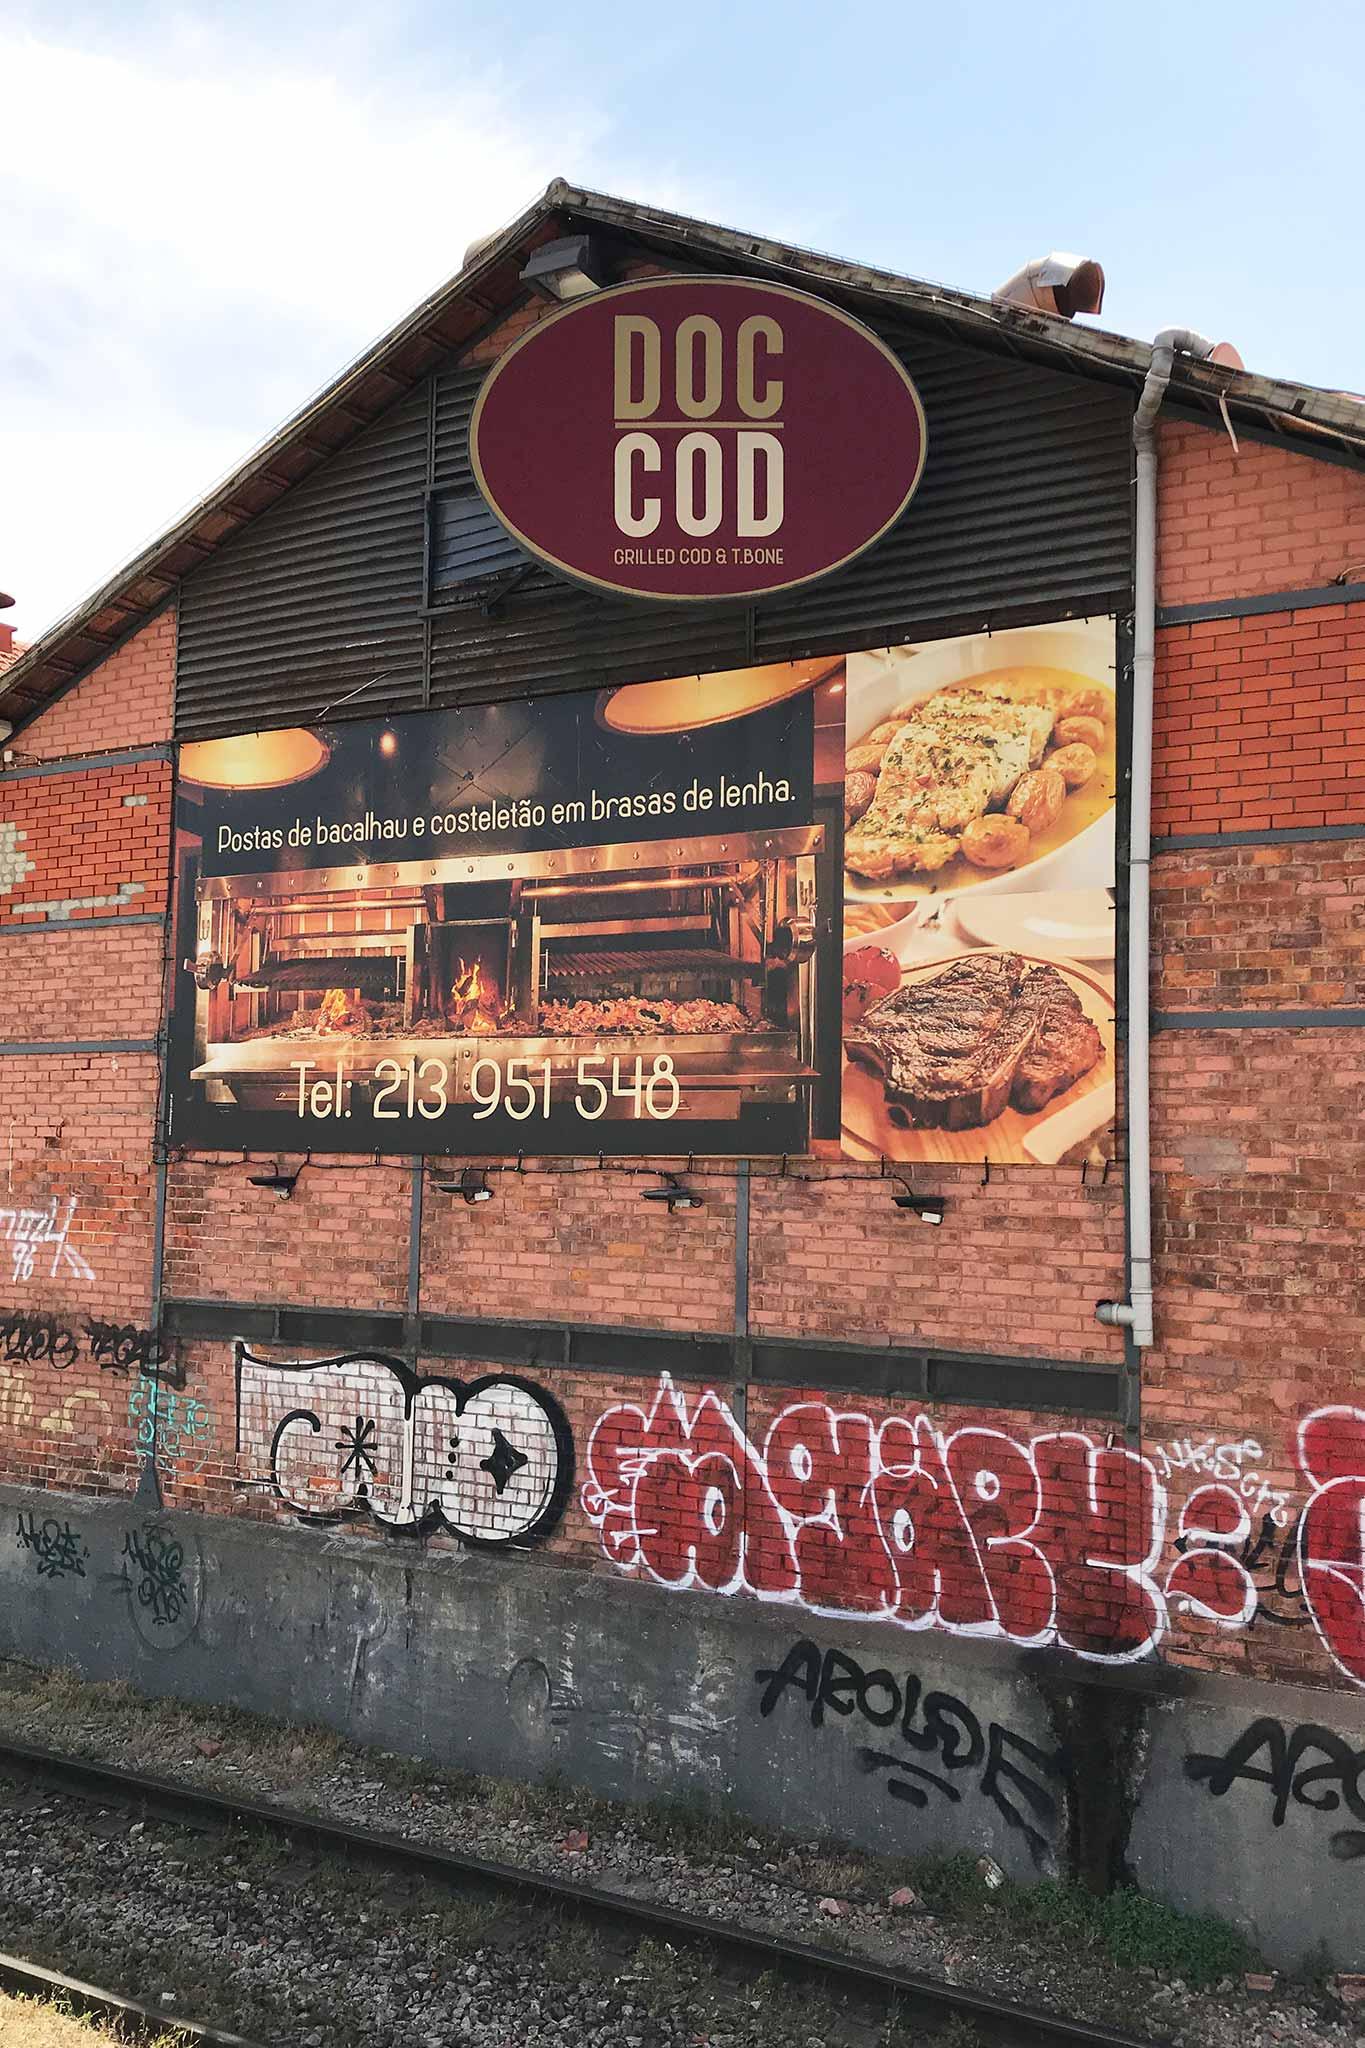 Mappe Lisbona In 10 Indirizzi Imperdibili Per Mangiare Pesce Carne